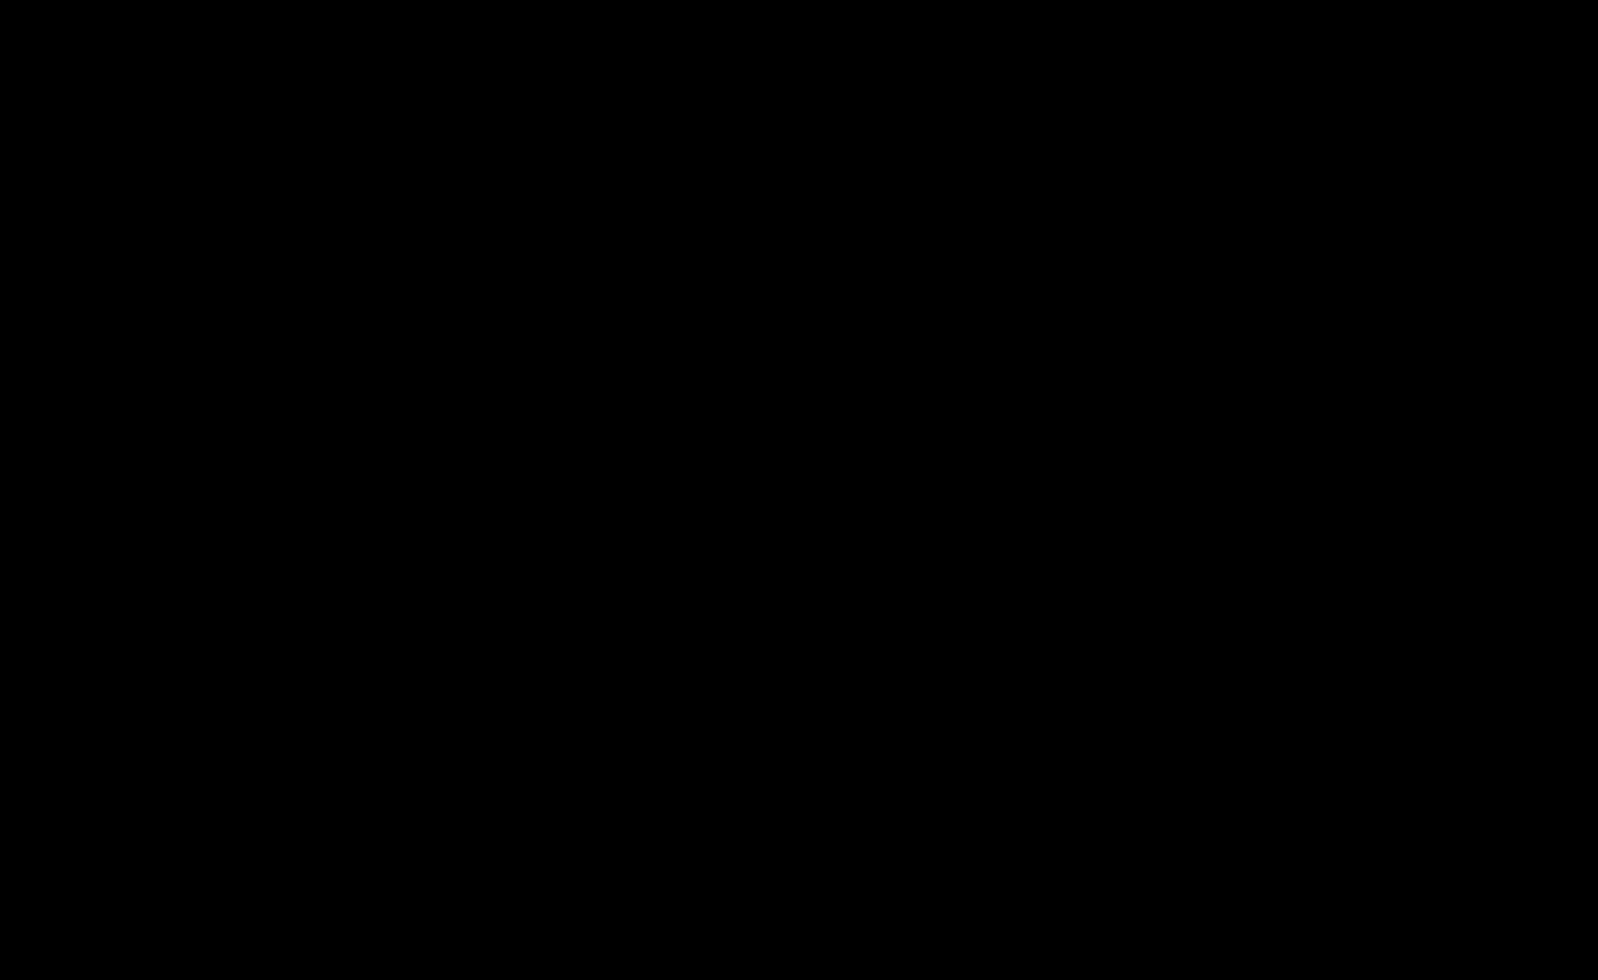 Billardtisch png